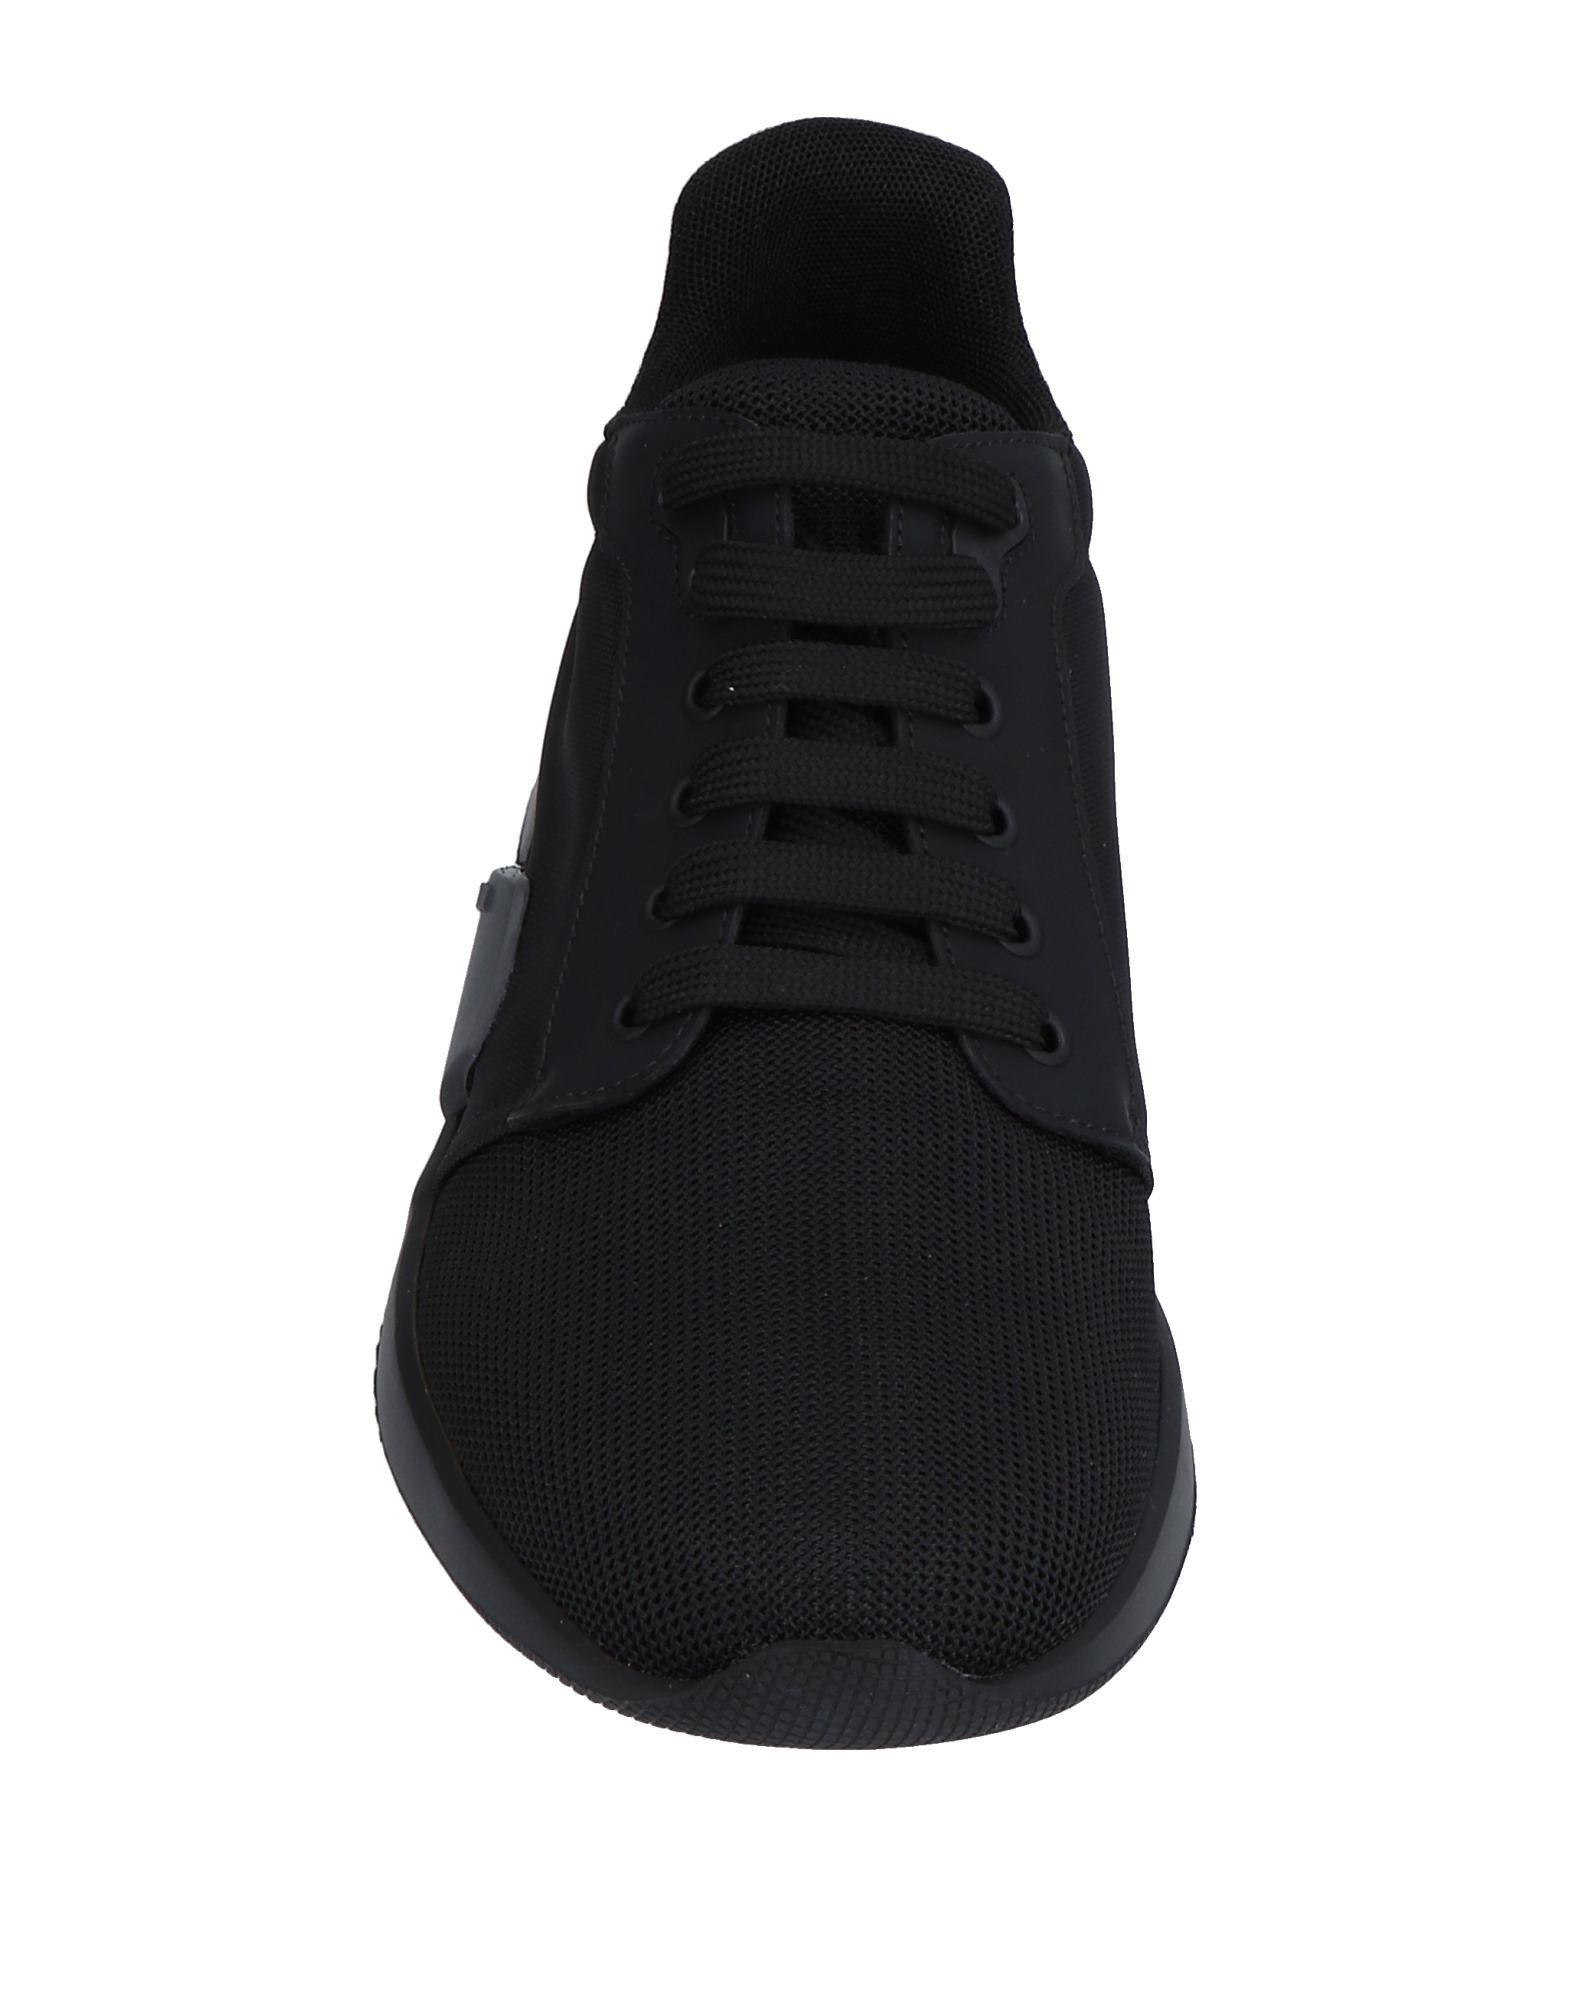 Prada 11492667GI Sport Sneakers Herren  11492667GI Prada Gute Qualität beliebte Schuhe 167a04